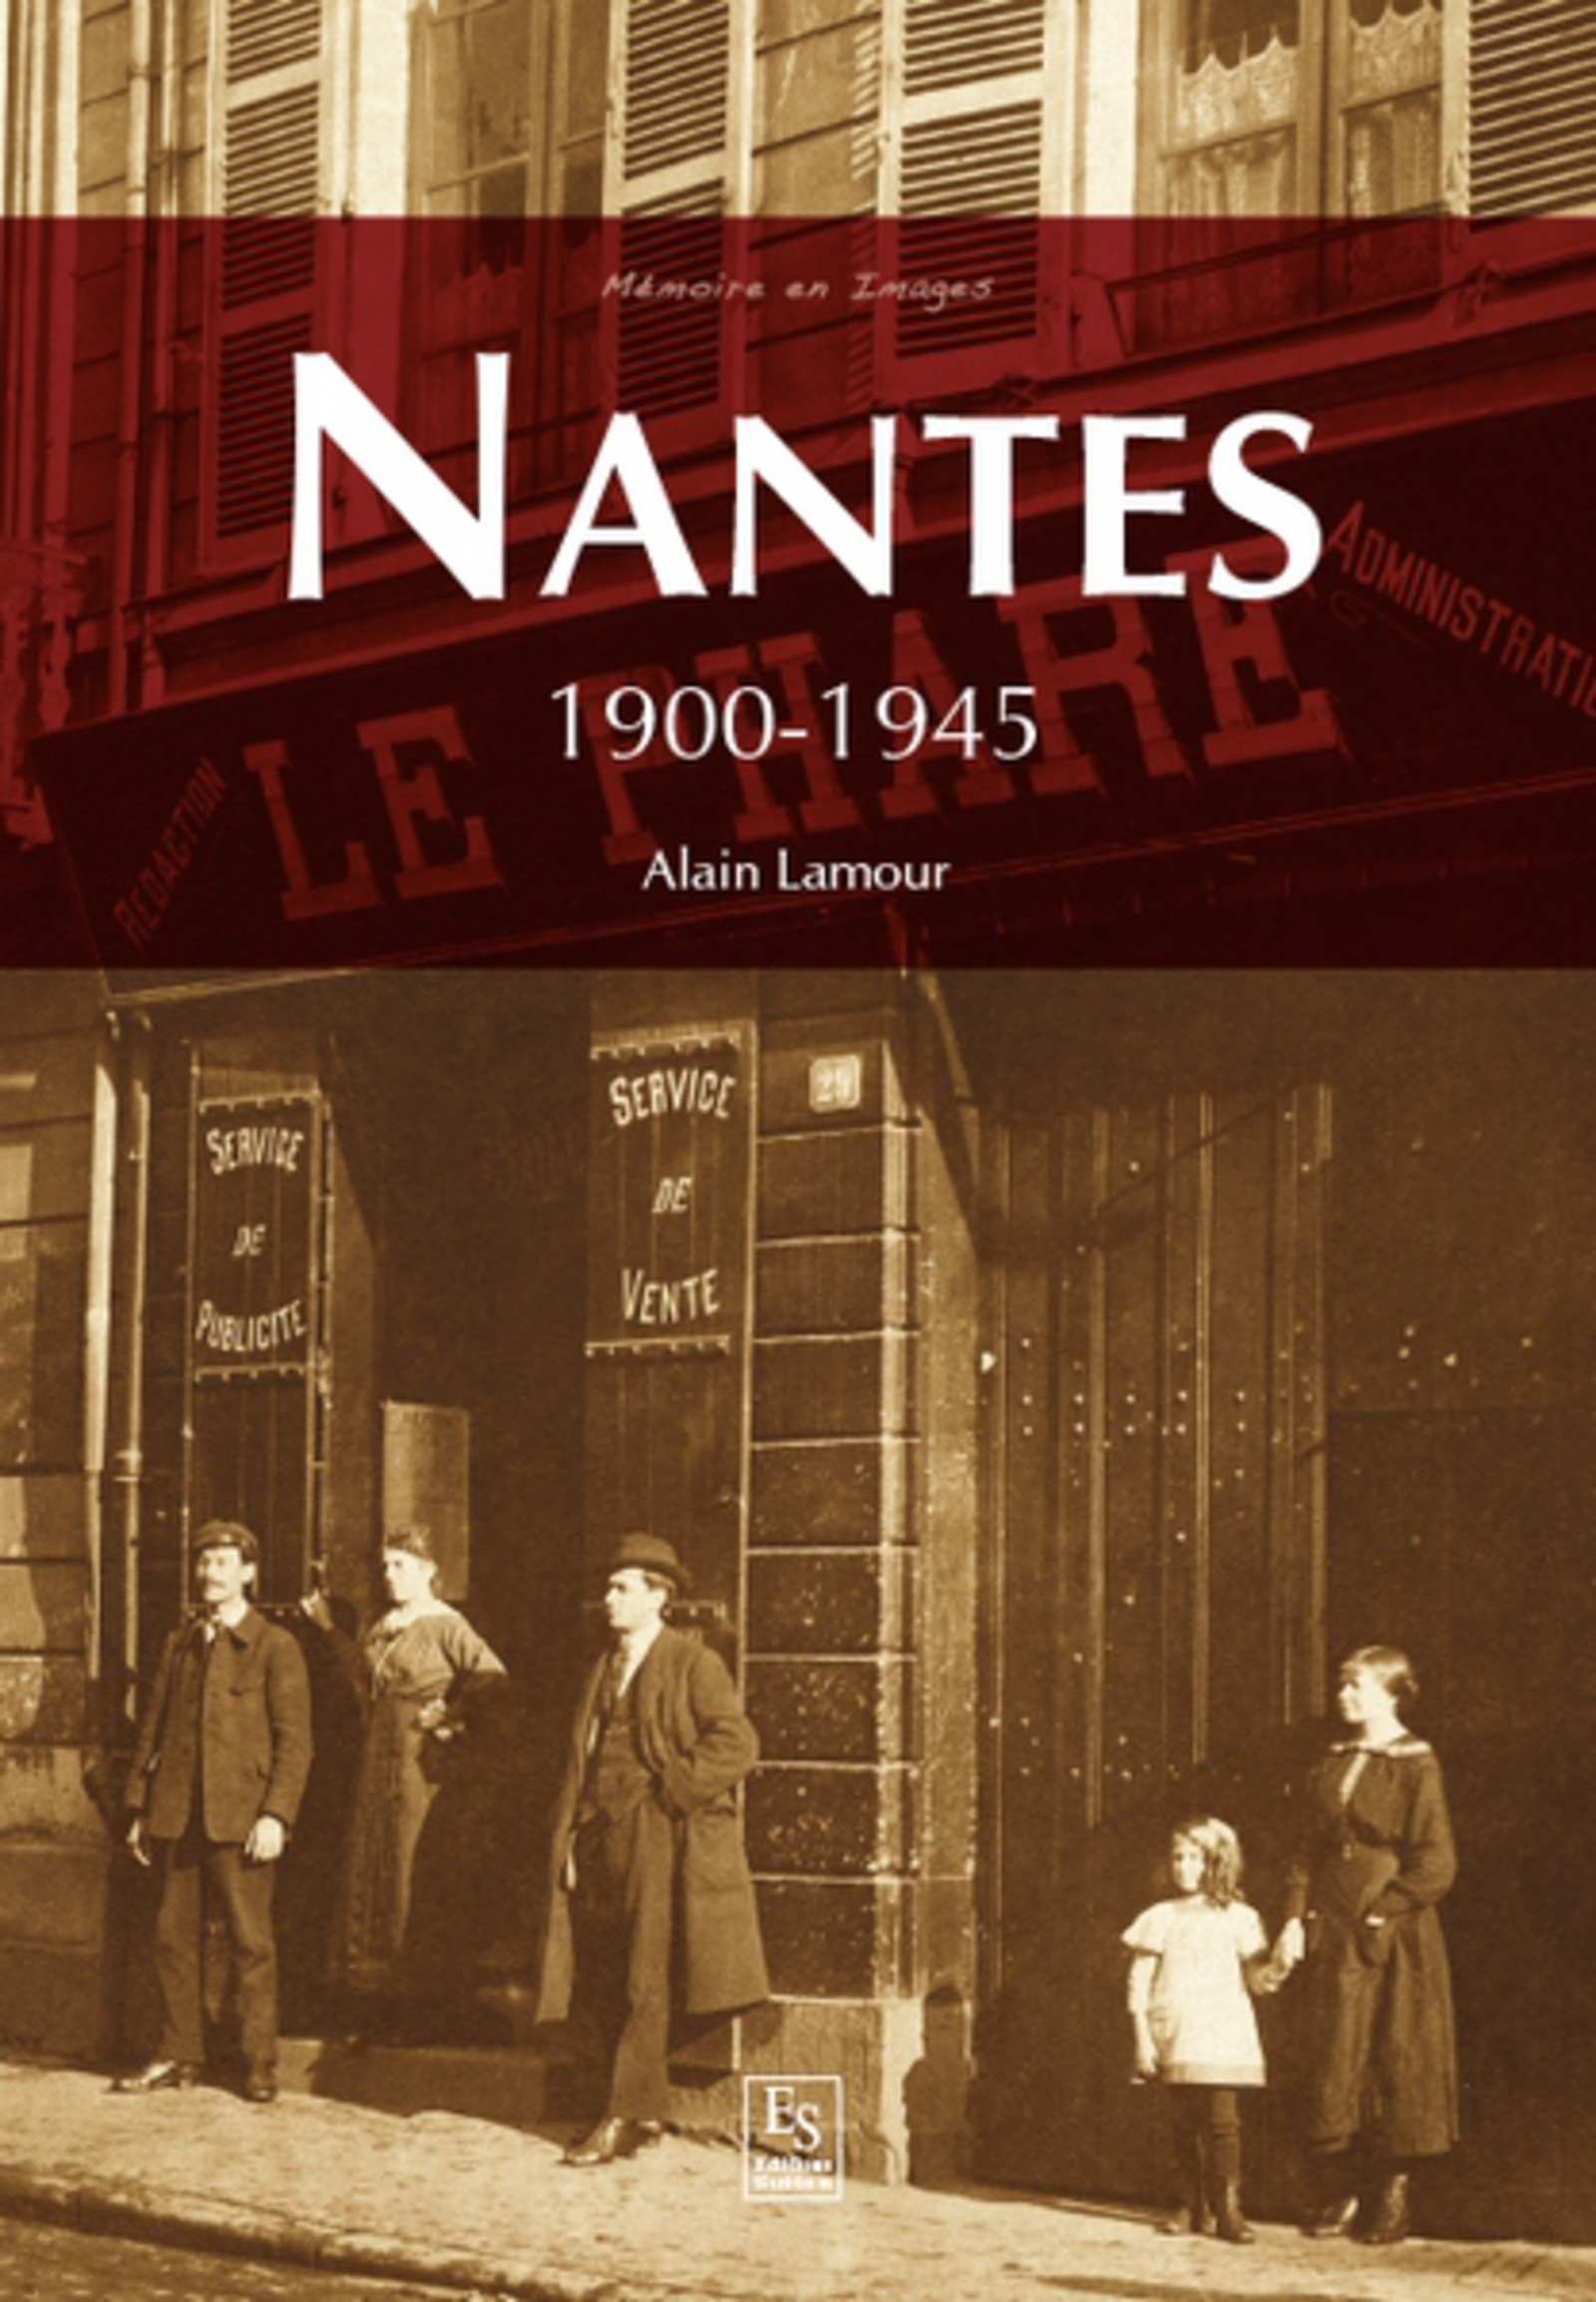 NANTES - 1900-1945